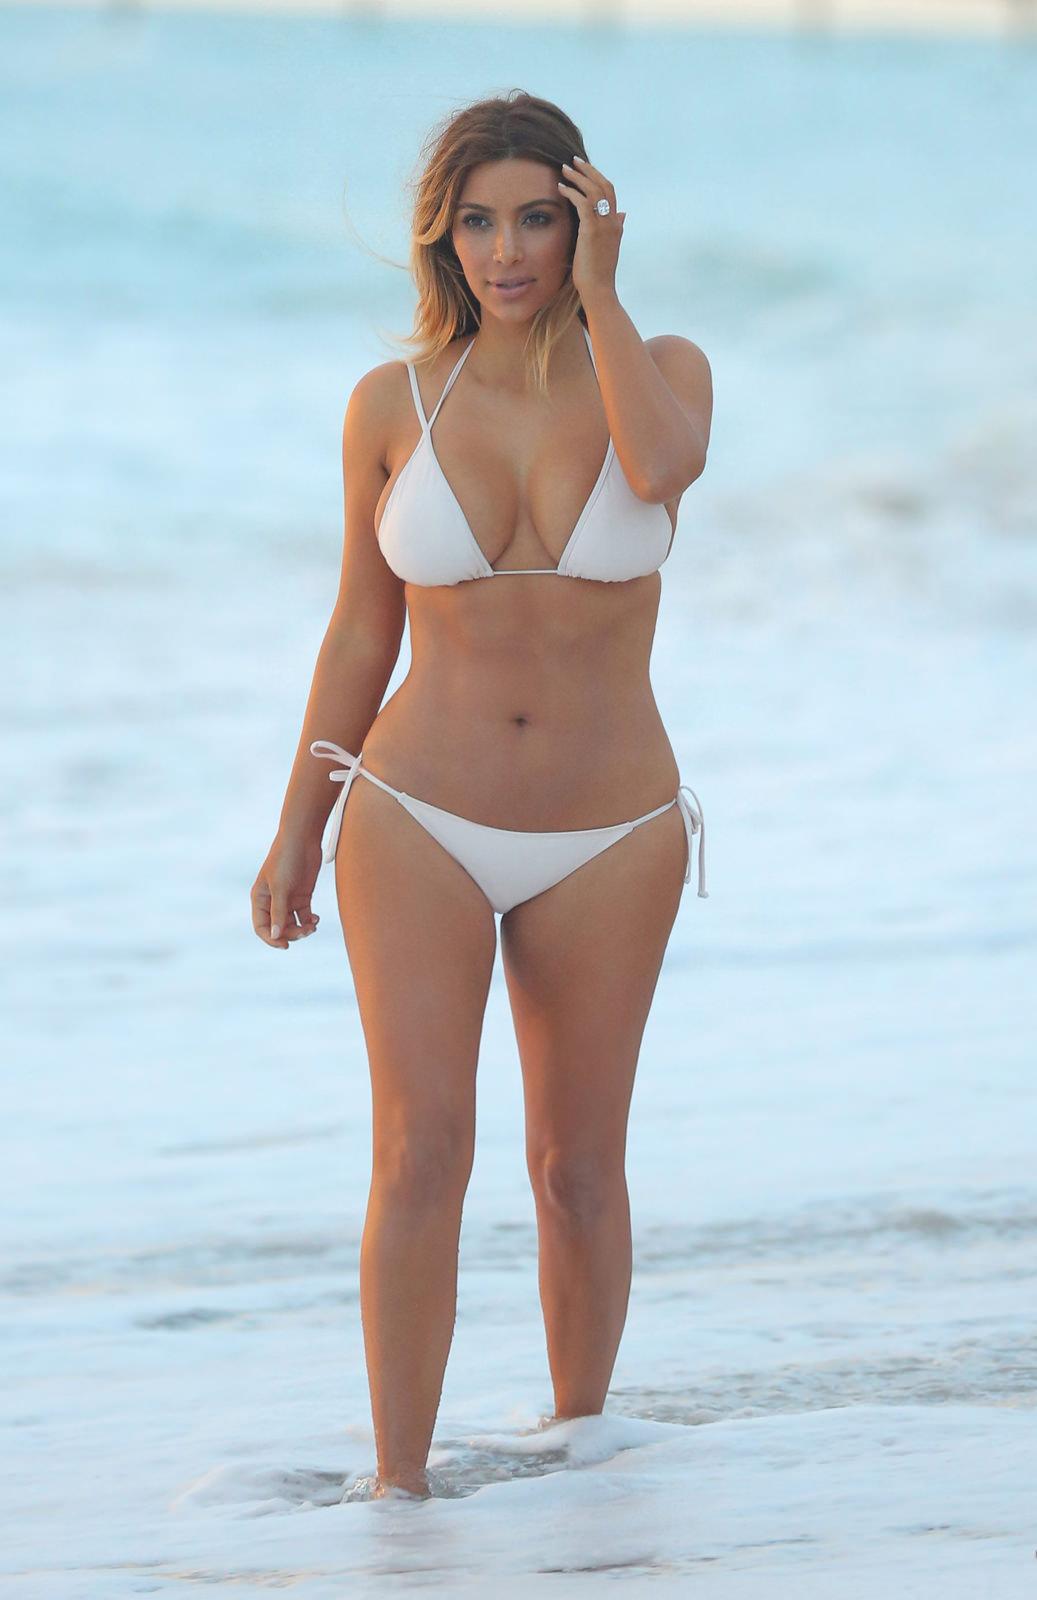 Kim Kardashian Photo Gallery